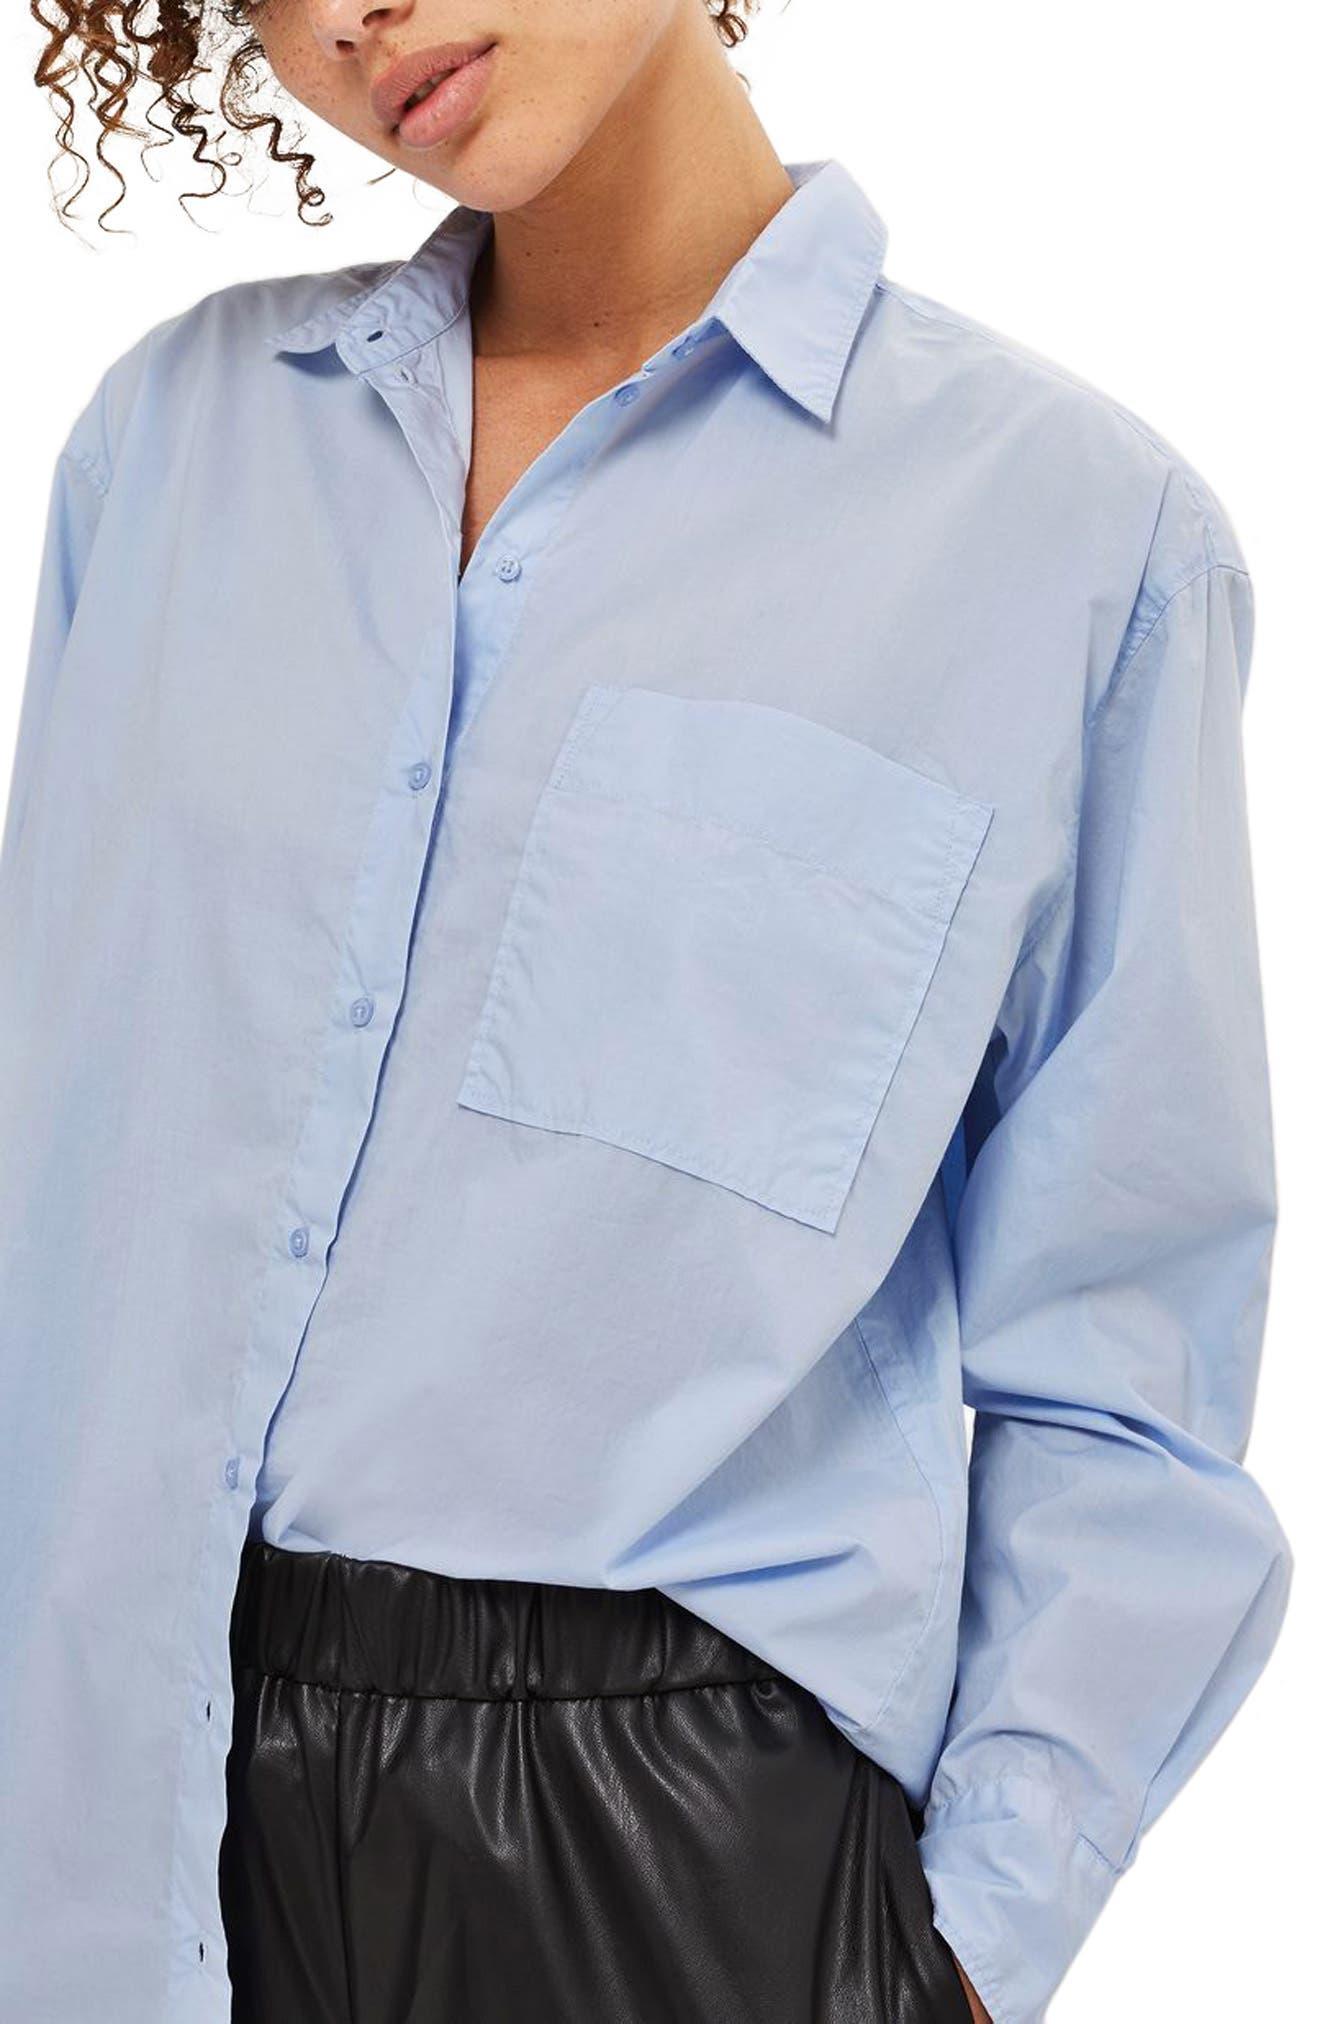 Topshop Olly Oversized Poplin Shirt